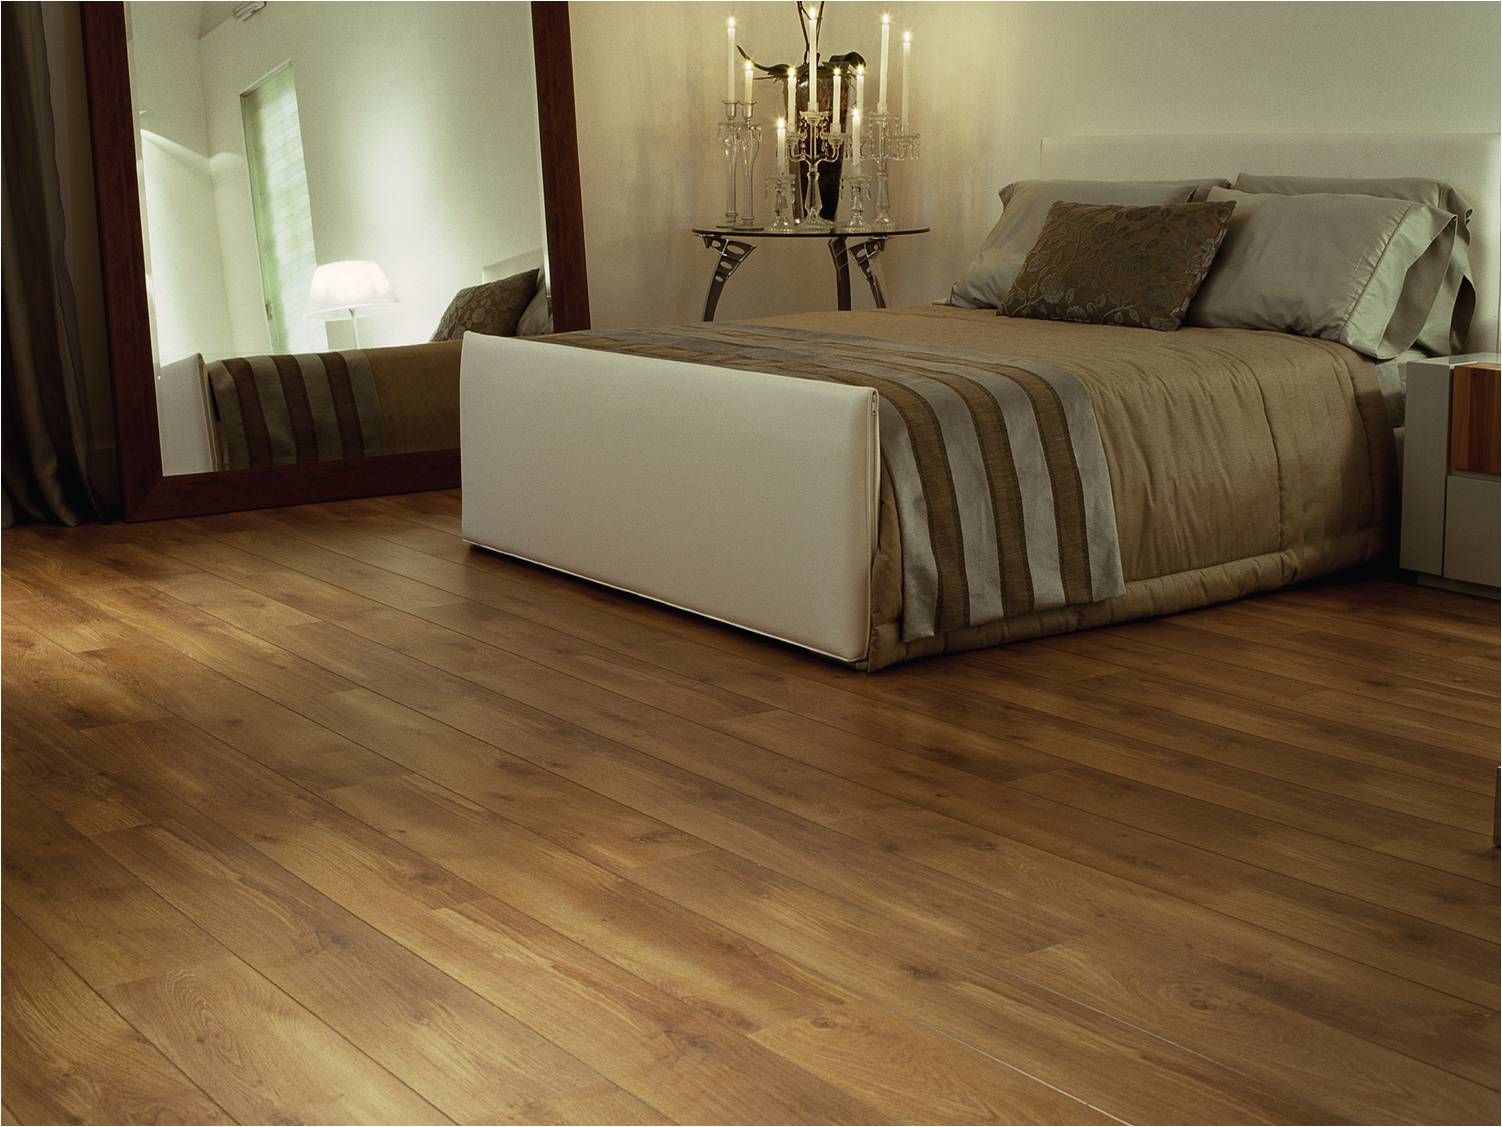 Piso laminado durafloor studio carvalho malta durafloor studio apresenta vincos laterais em - Compartir piso en malta ...